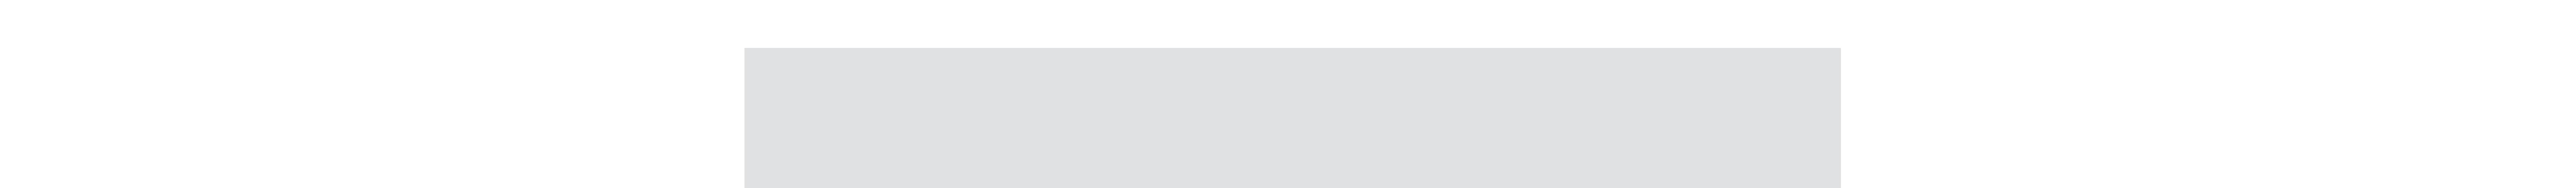 Why Buildup